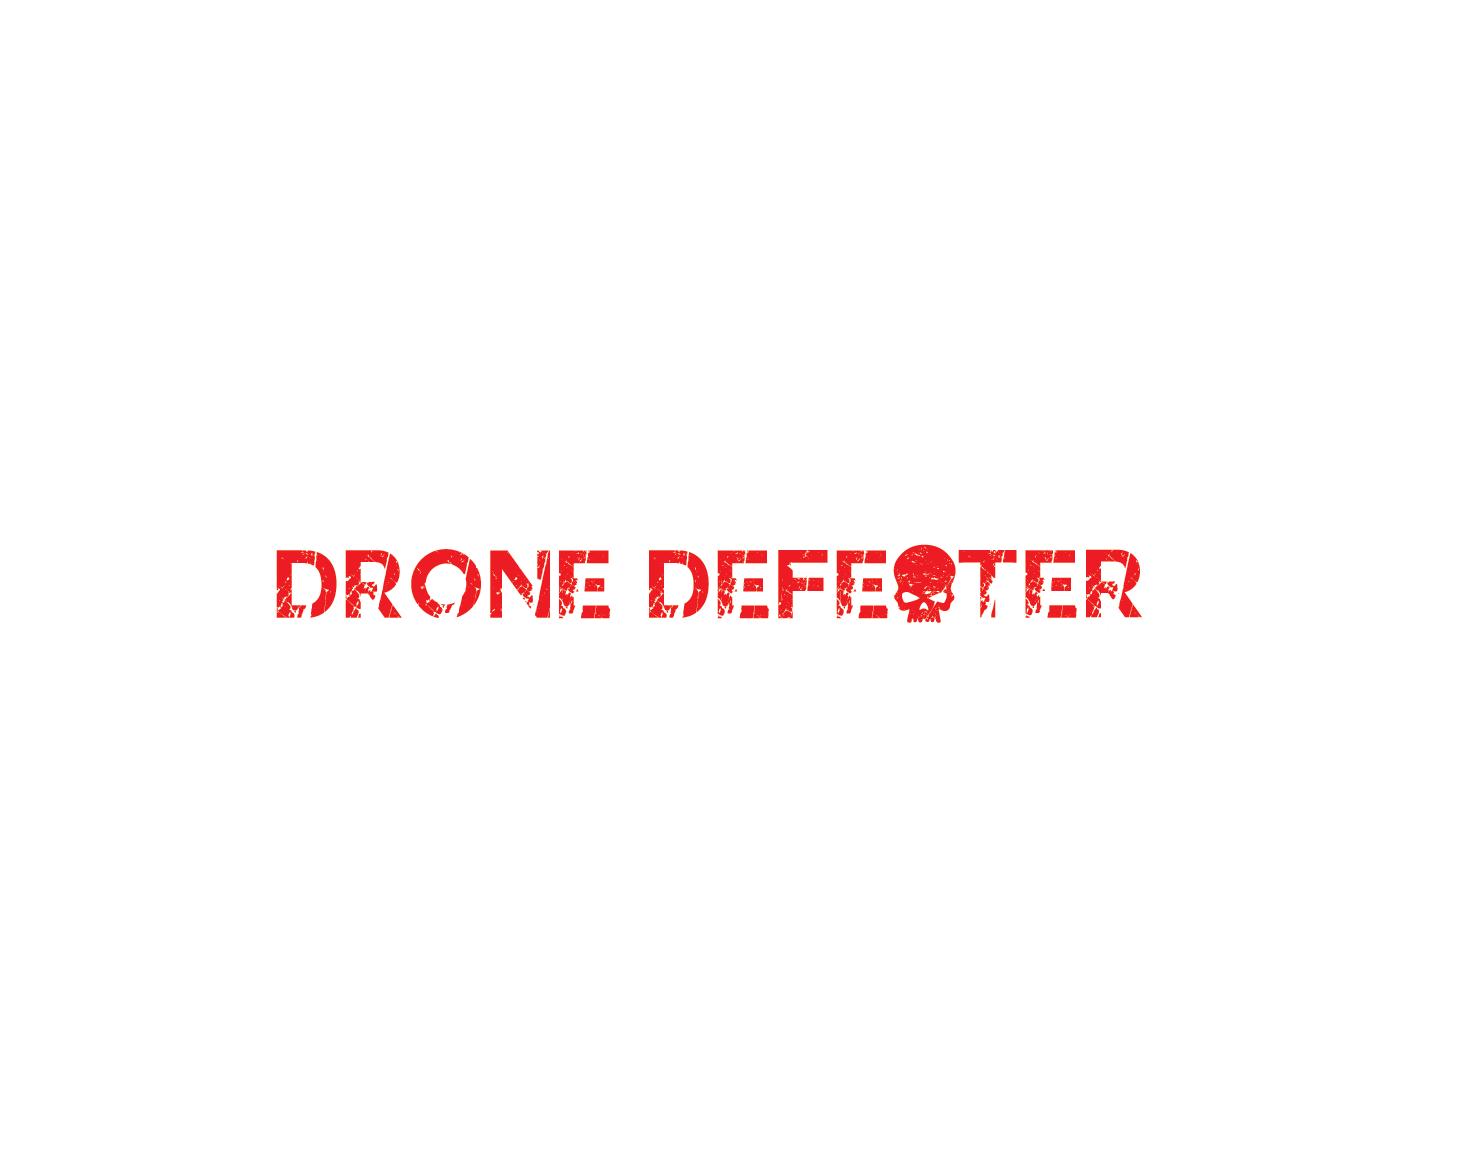 Logo Design by Rizky Adam - Entry No. 61 in the Logo Design Contest Artistic Logo Design for Drone Defeater.